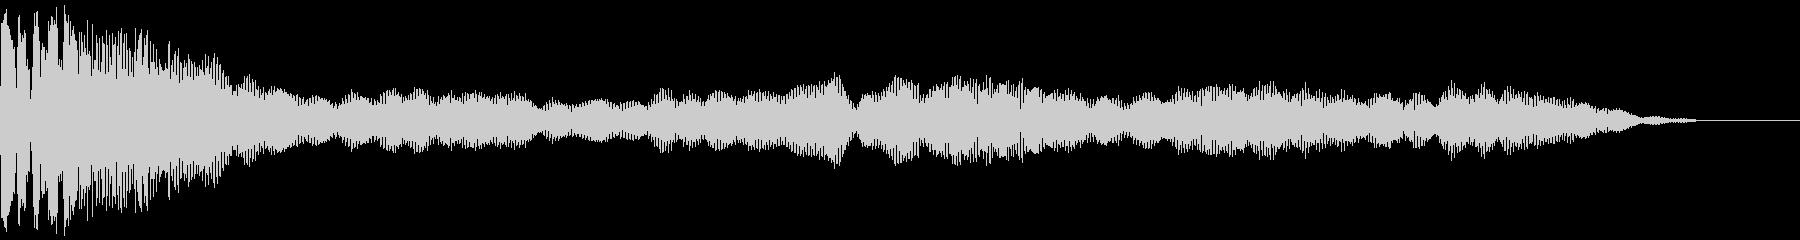 SynthHit EC03_16_1の未再生の波形